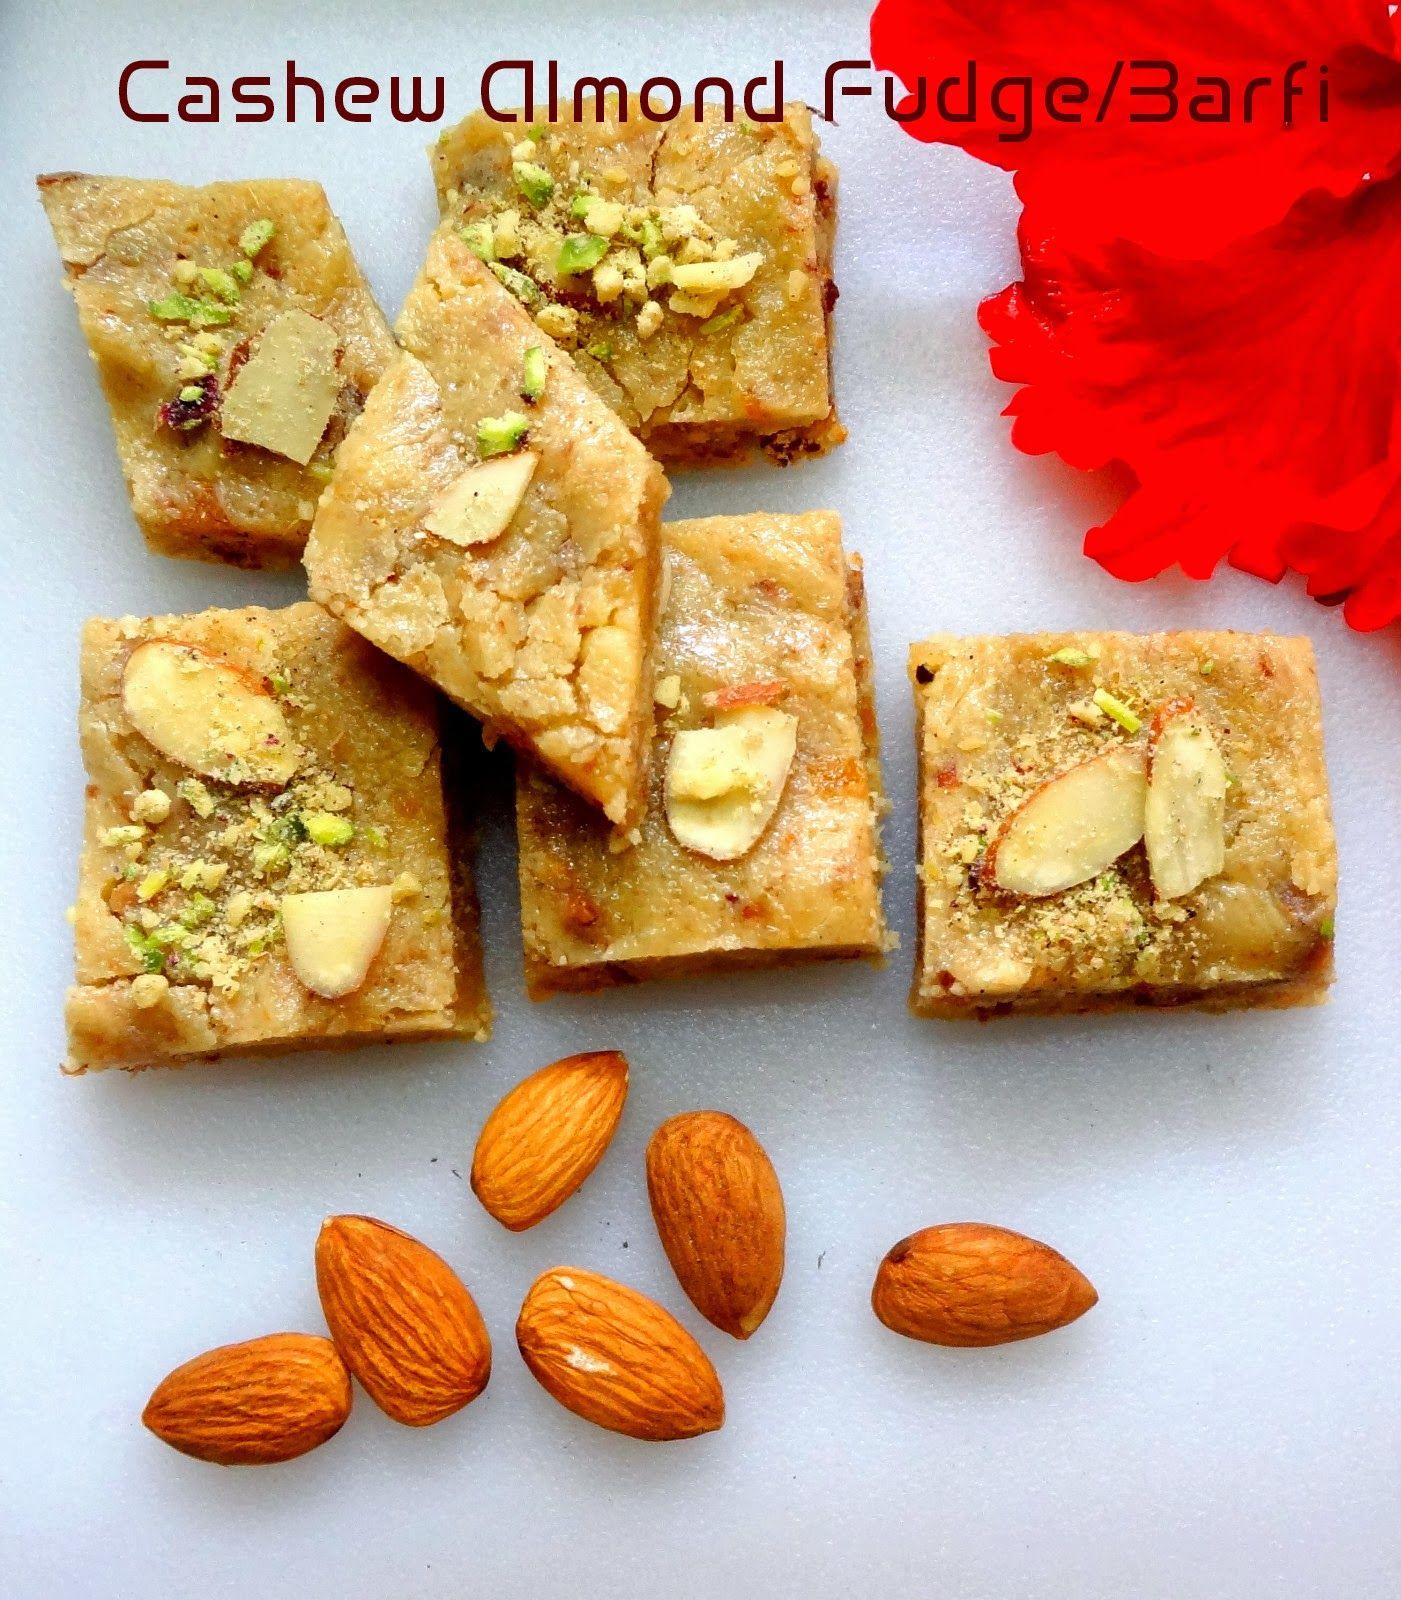 Your Everyday Cook: Cashew Almond Barfi/Fudge...Diwali Recipe.